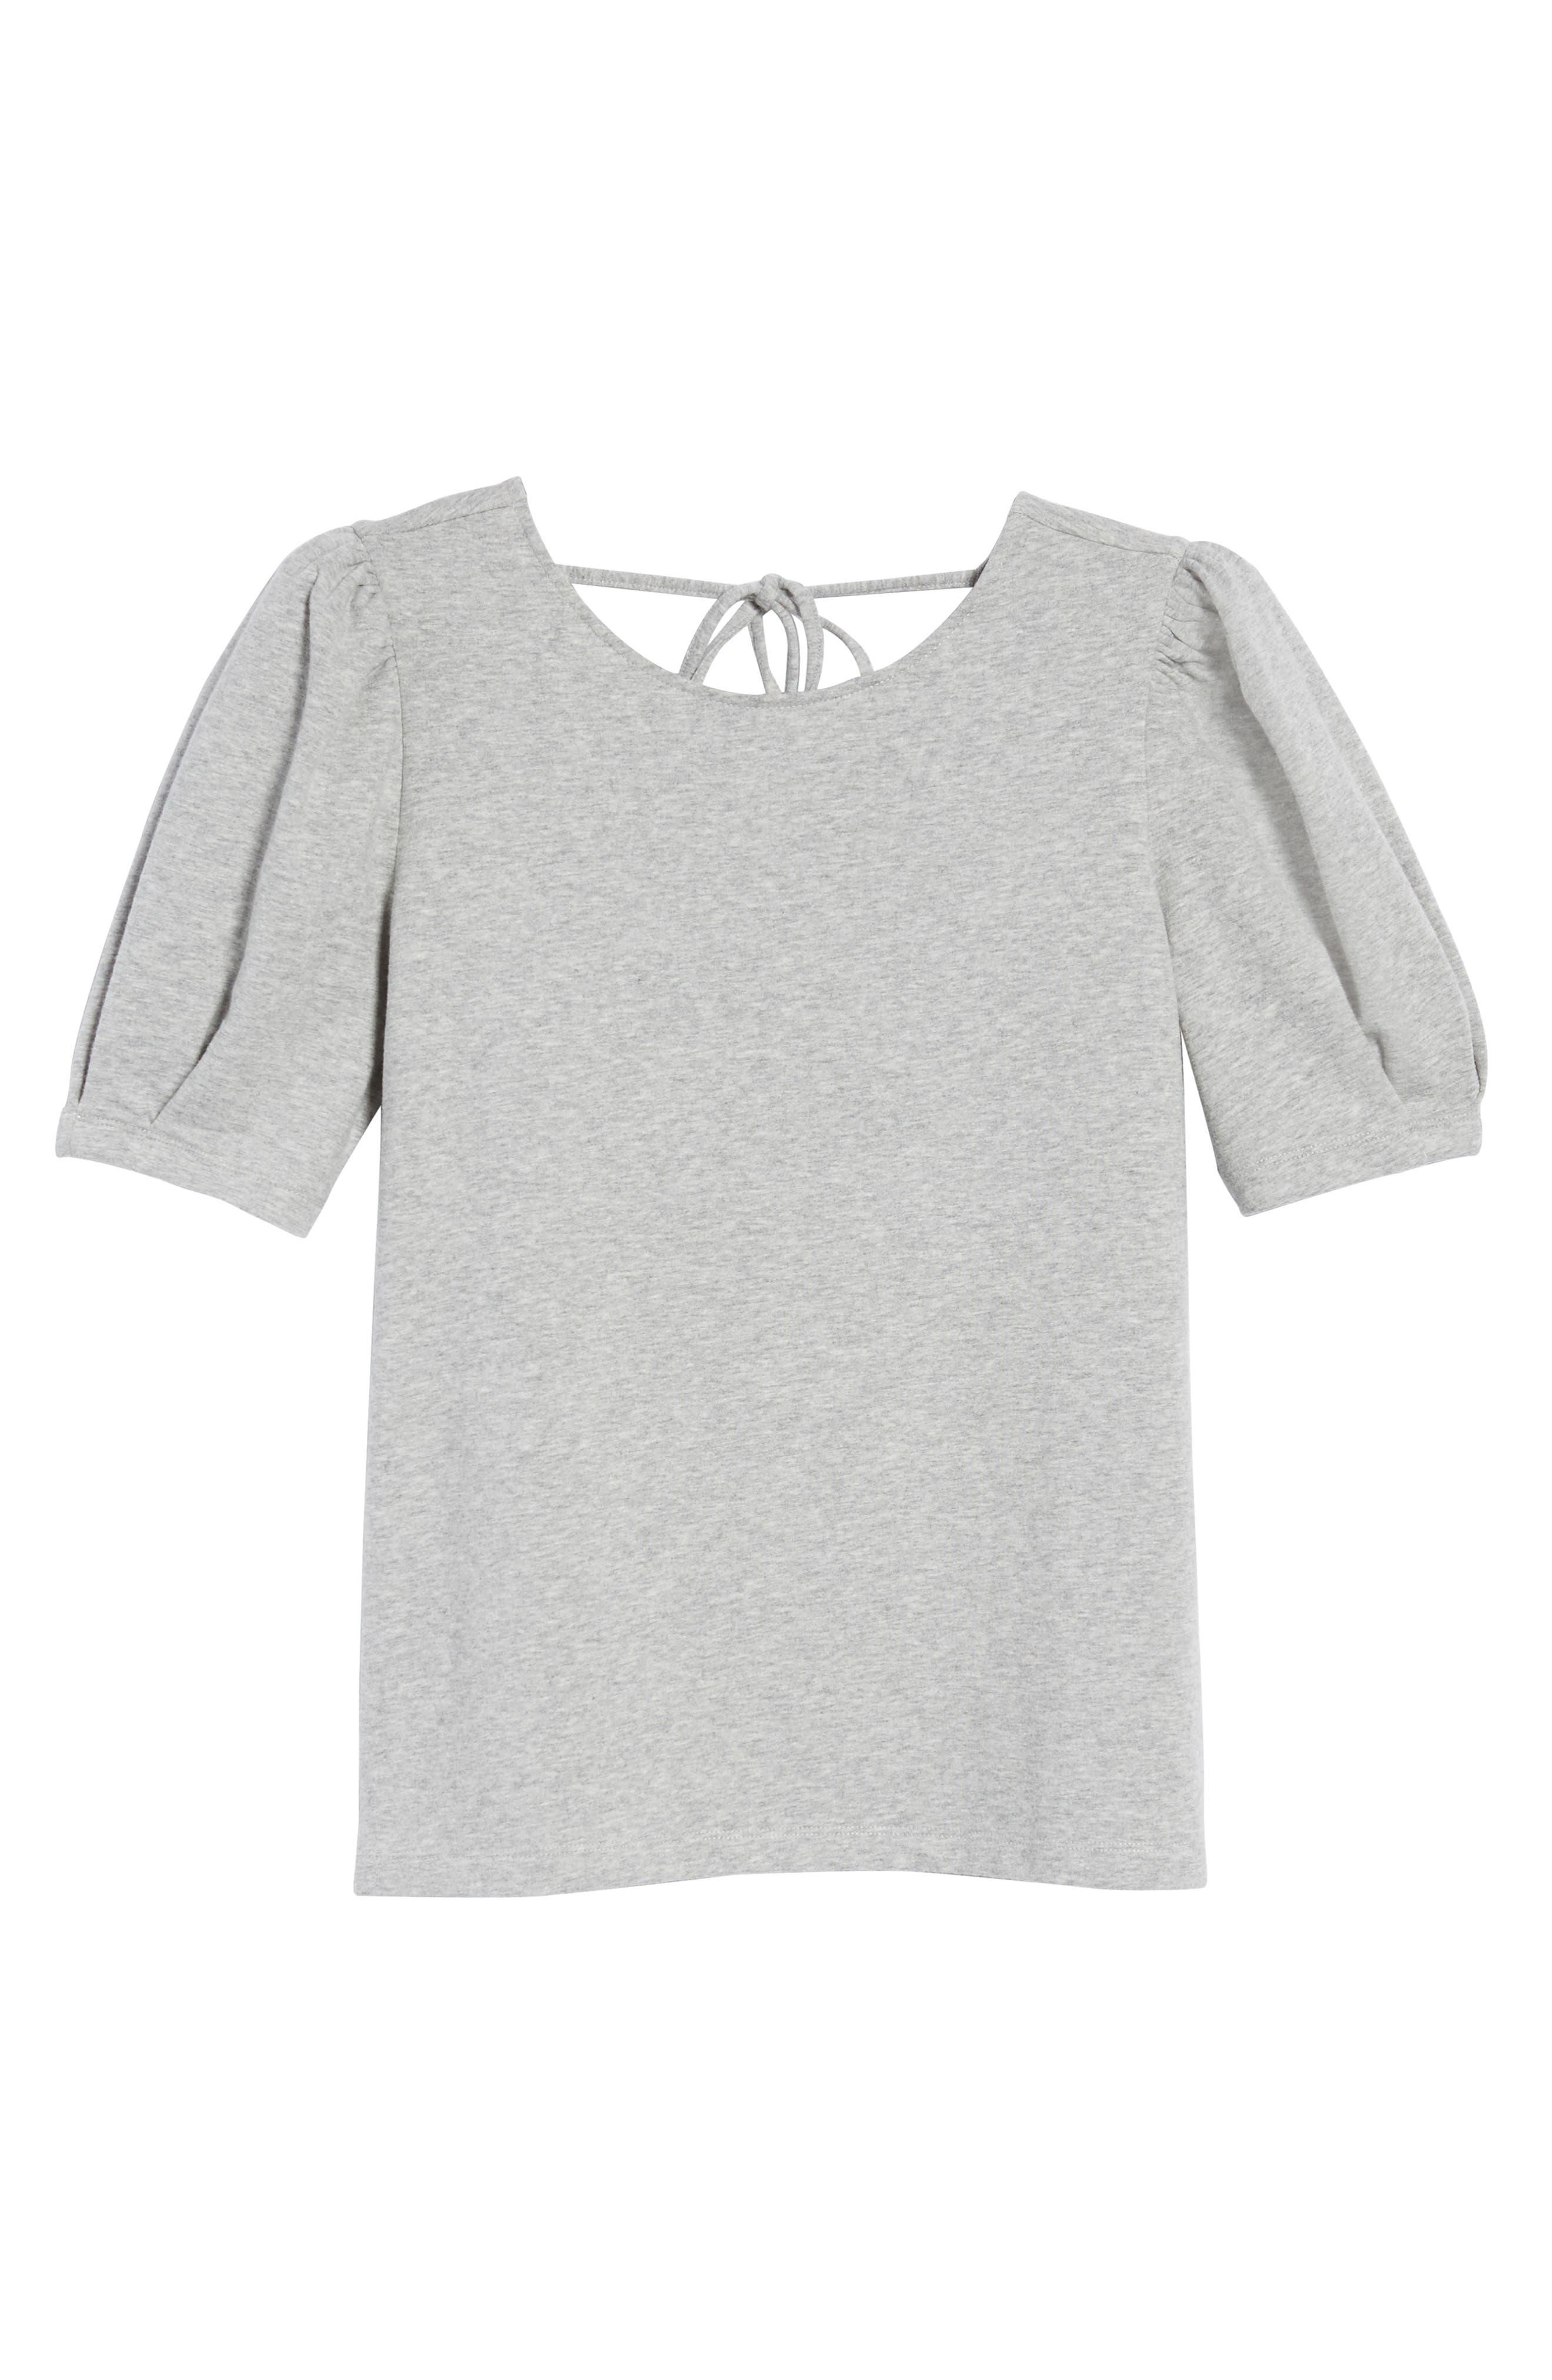 Tie Back Sweatshirt,                             Alternate thumbnail 6, color,                             Grey Heather